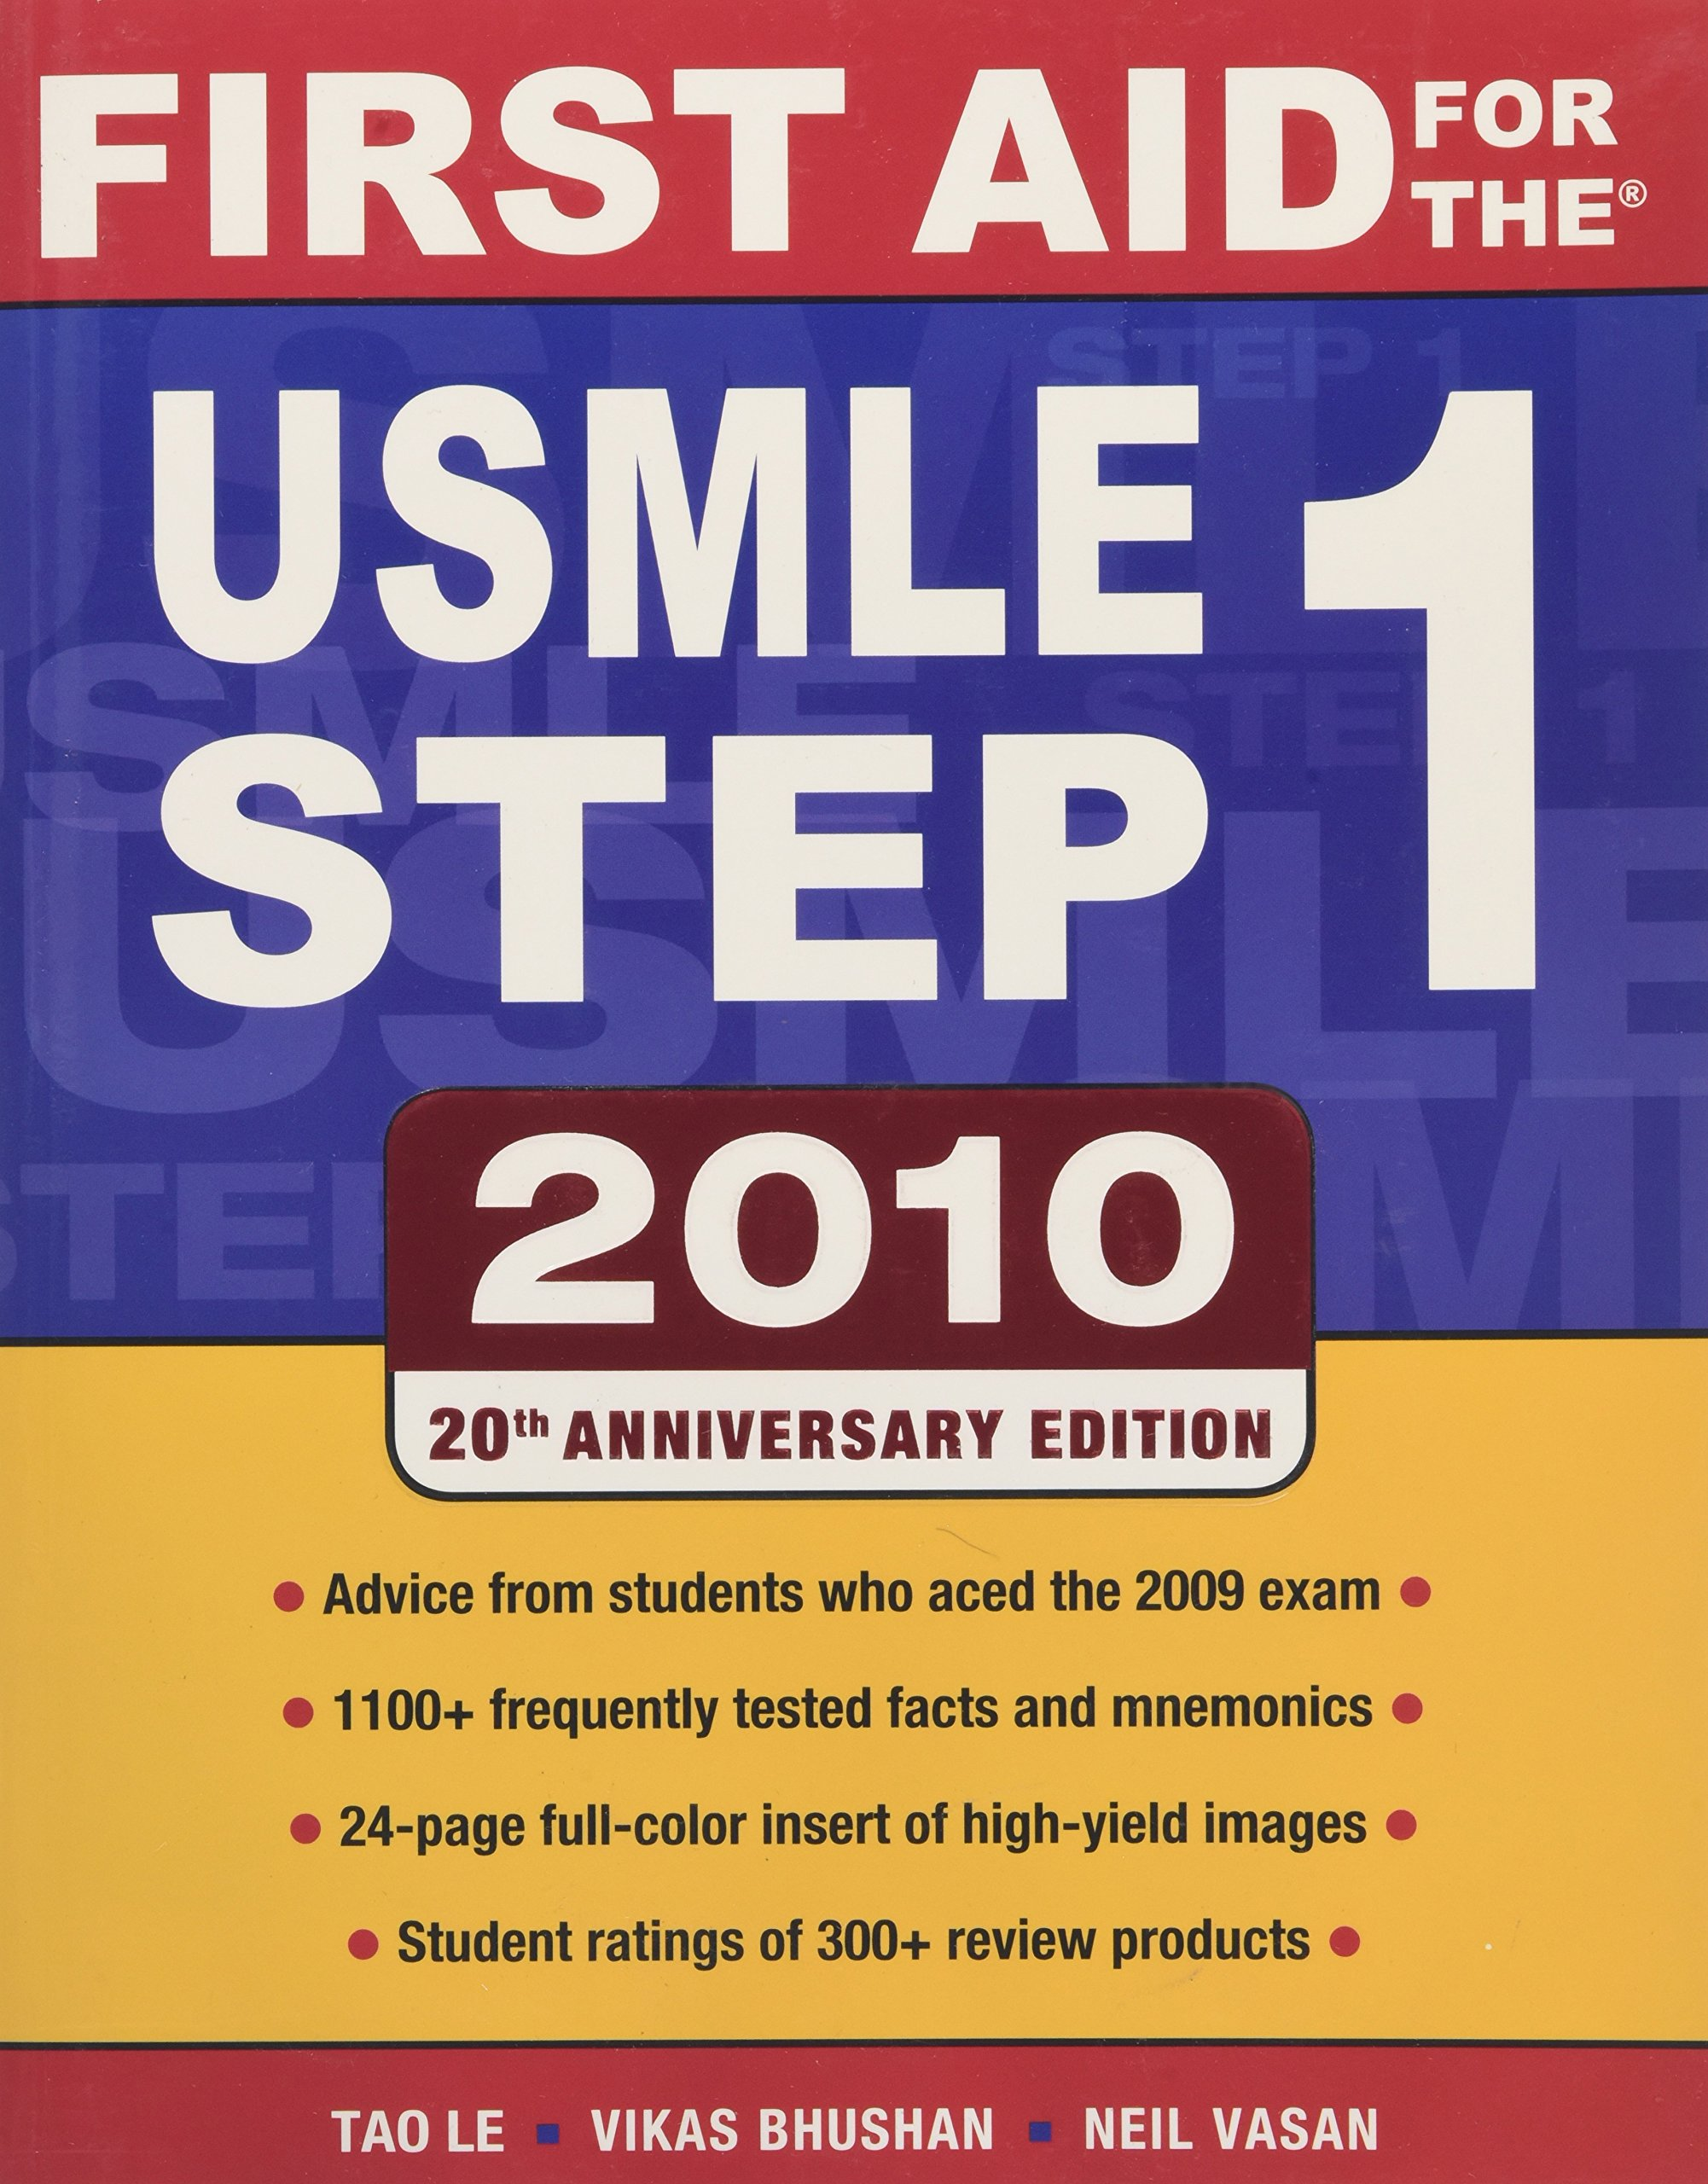 First Aid for the USMLE Step 1 2010: Vikas Bhushan, Tao Le: 9780071633406:  Amazon.com: Books